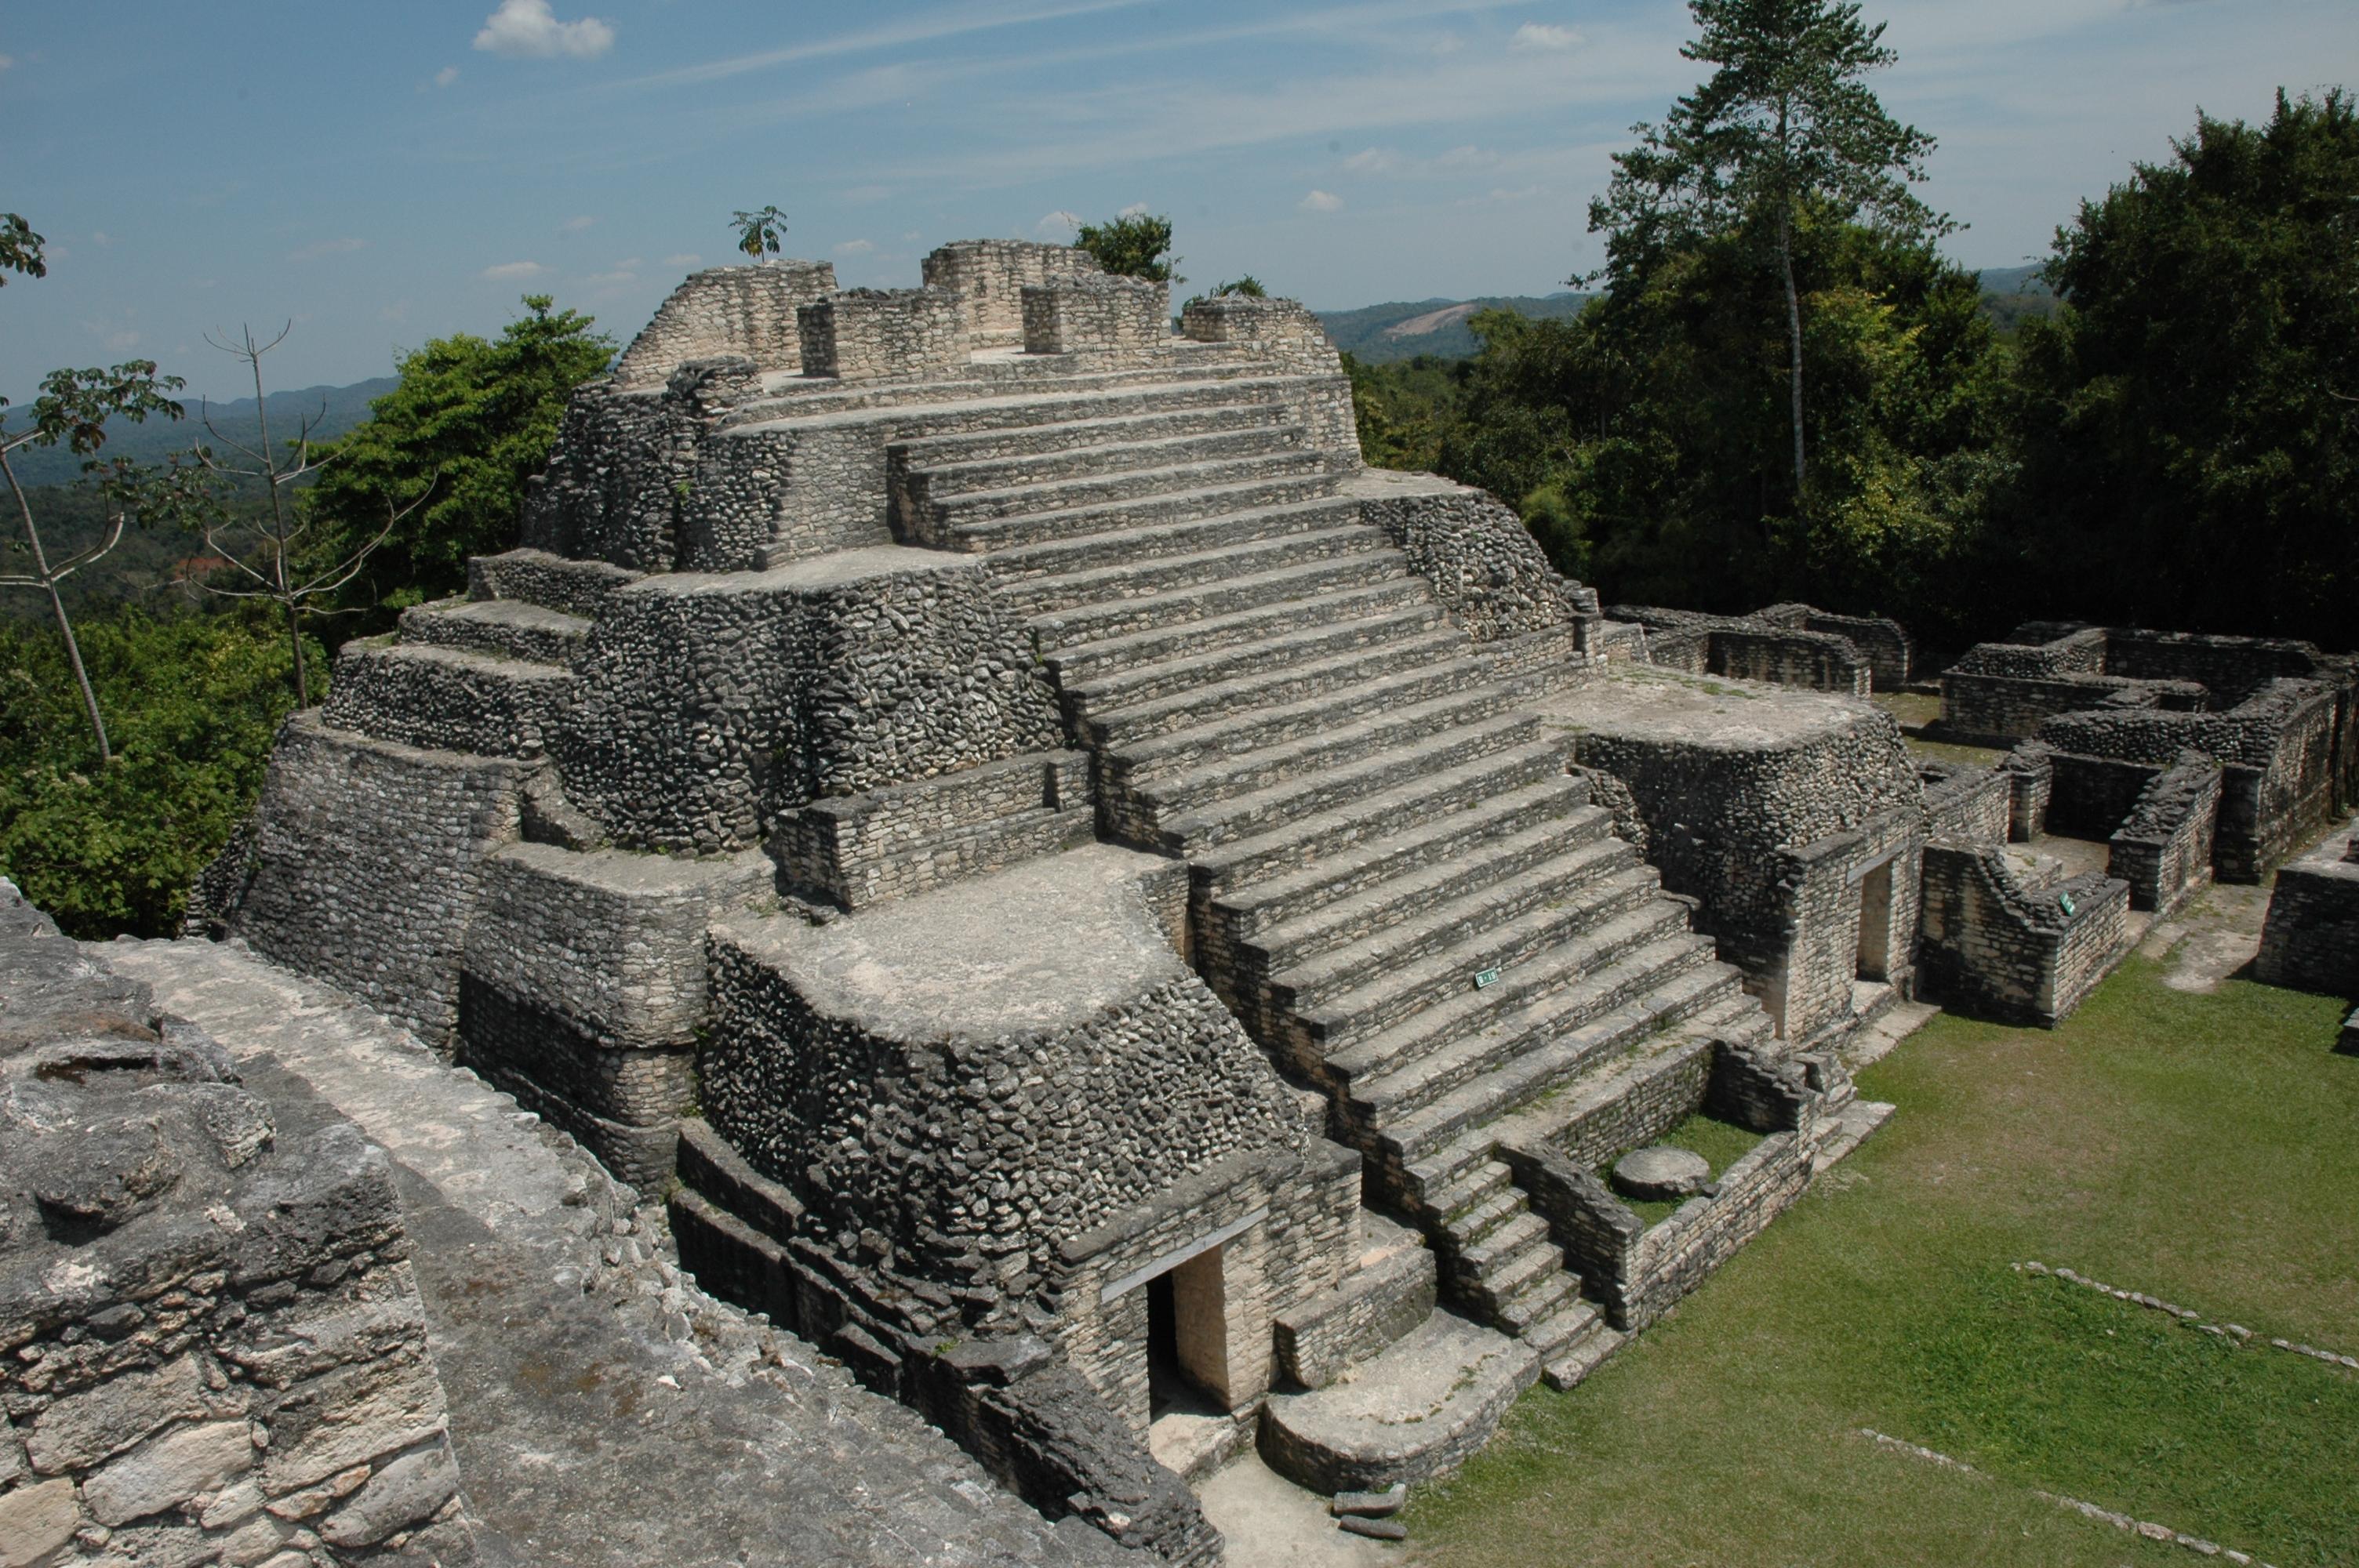 Maya peoples